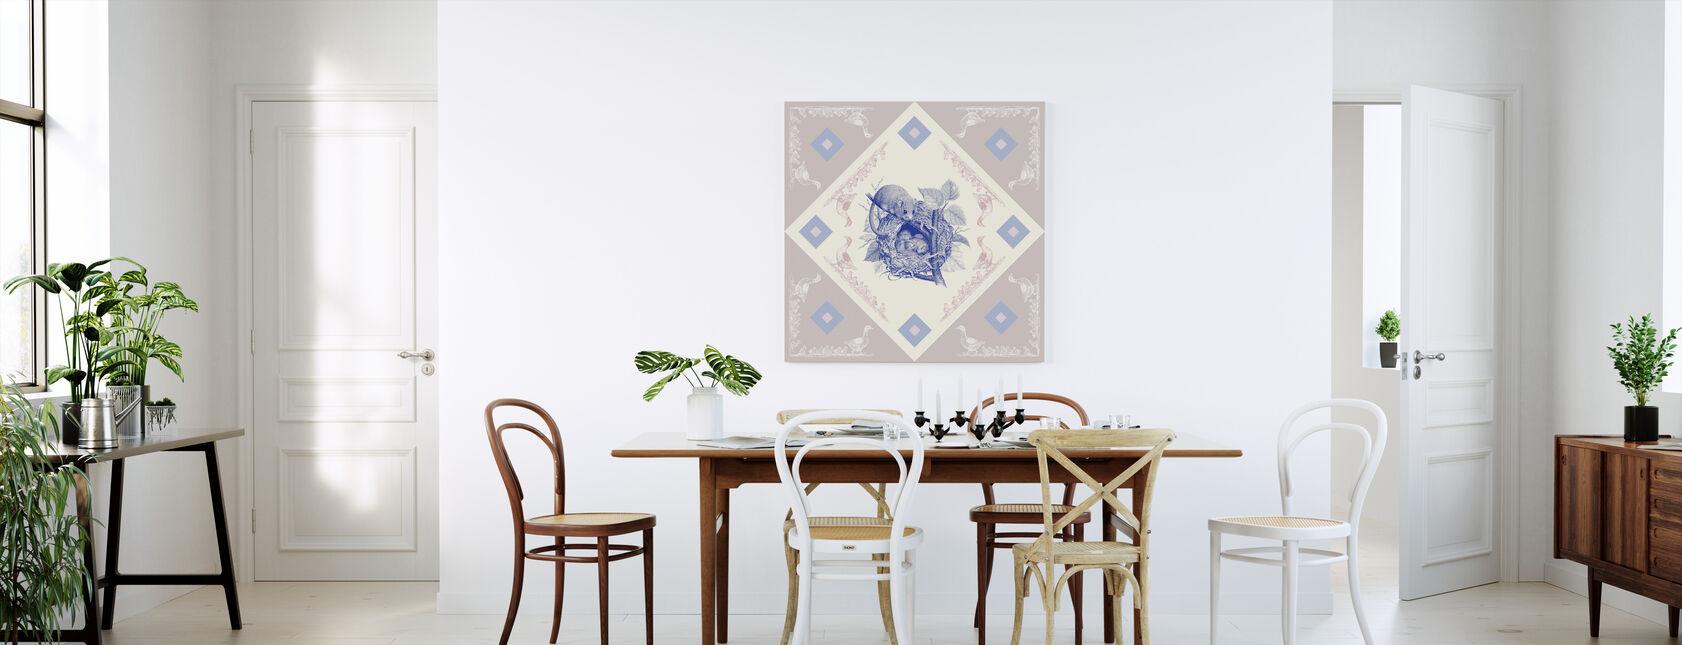 Slaapmuis, Blauw Roze - Canvas print - Keuken